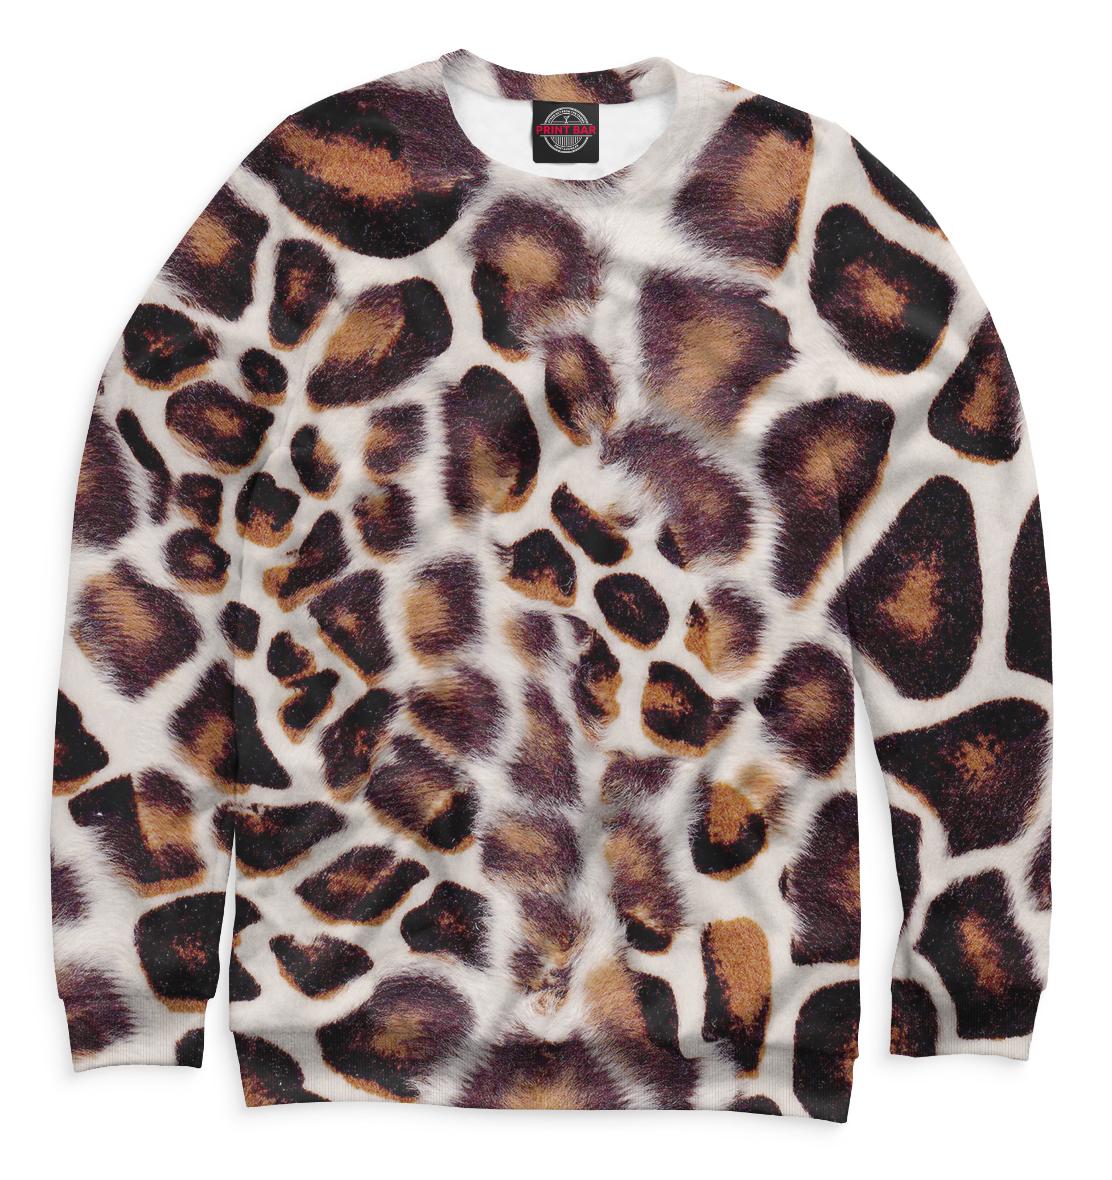 Купить Дымчатый леопард, Printbar, Свитшоты, OKR-260614-swi-2